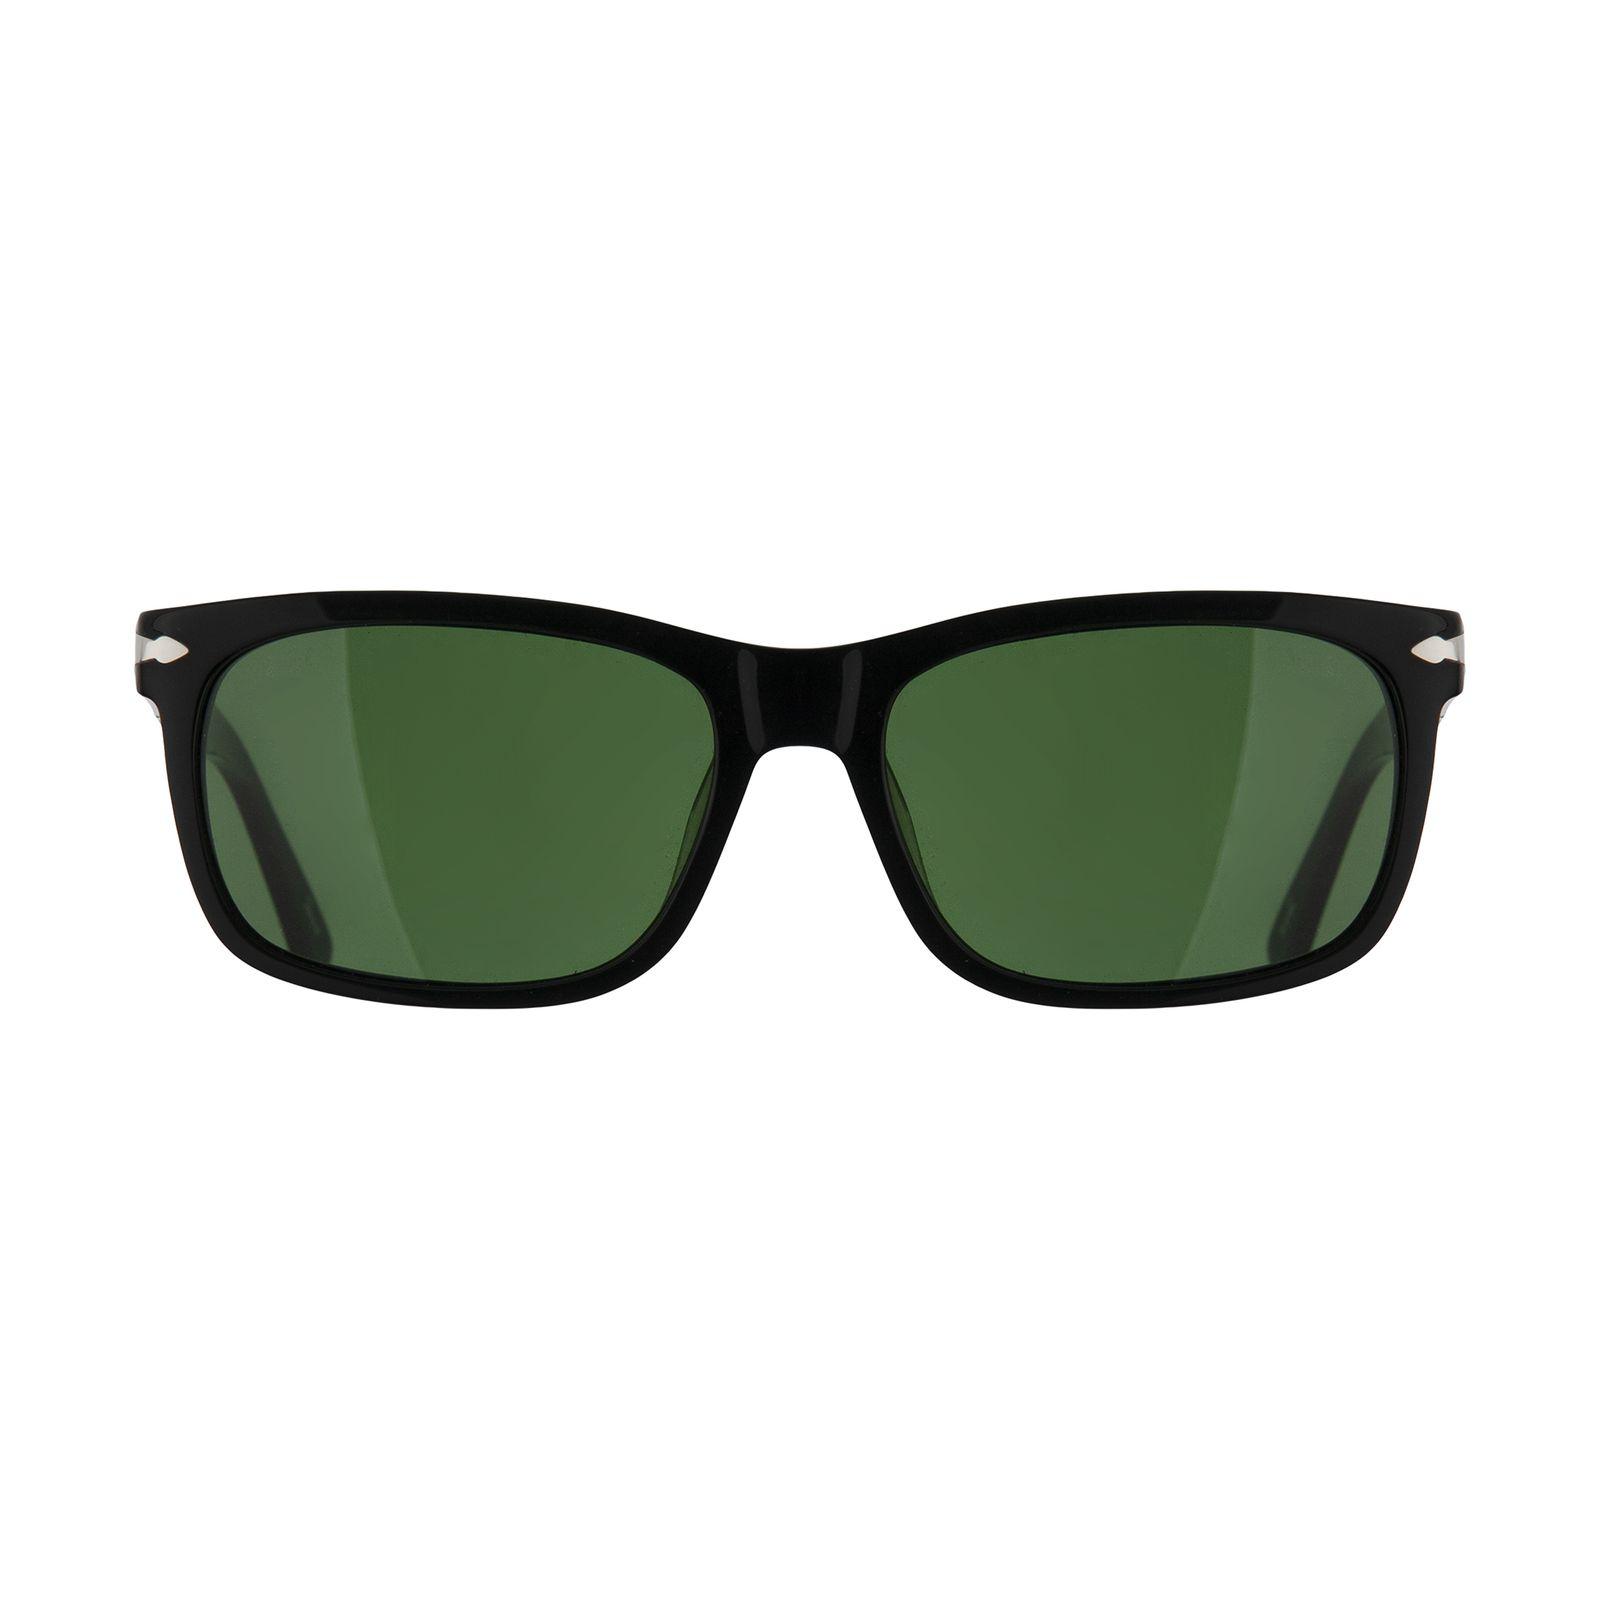 عینک آفتابی پرسول مدل 3062 -  - 2